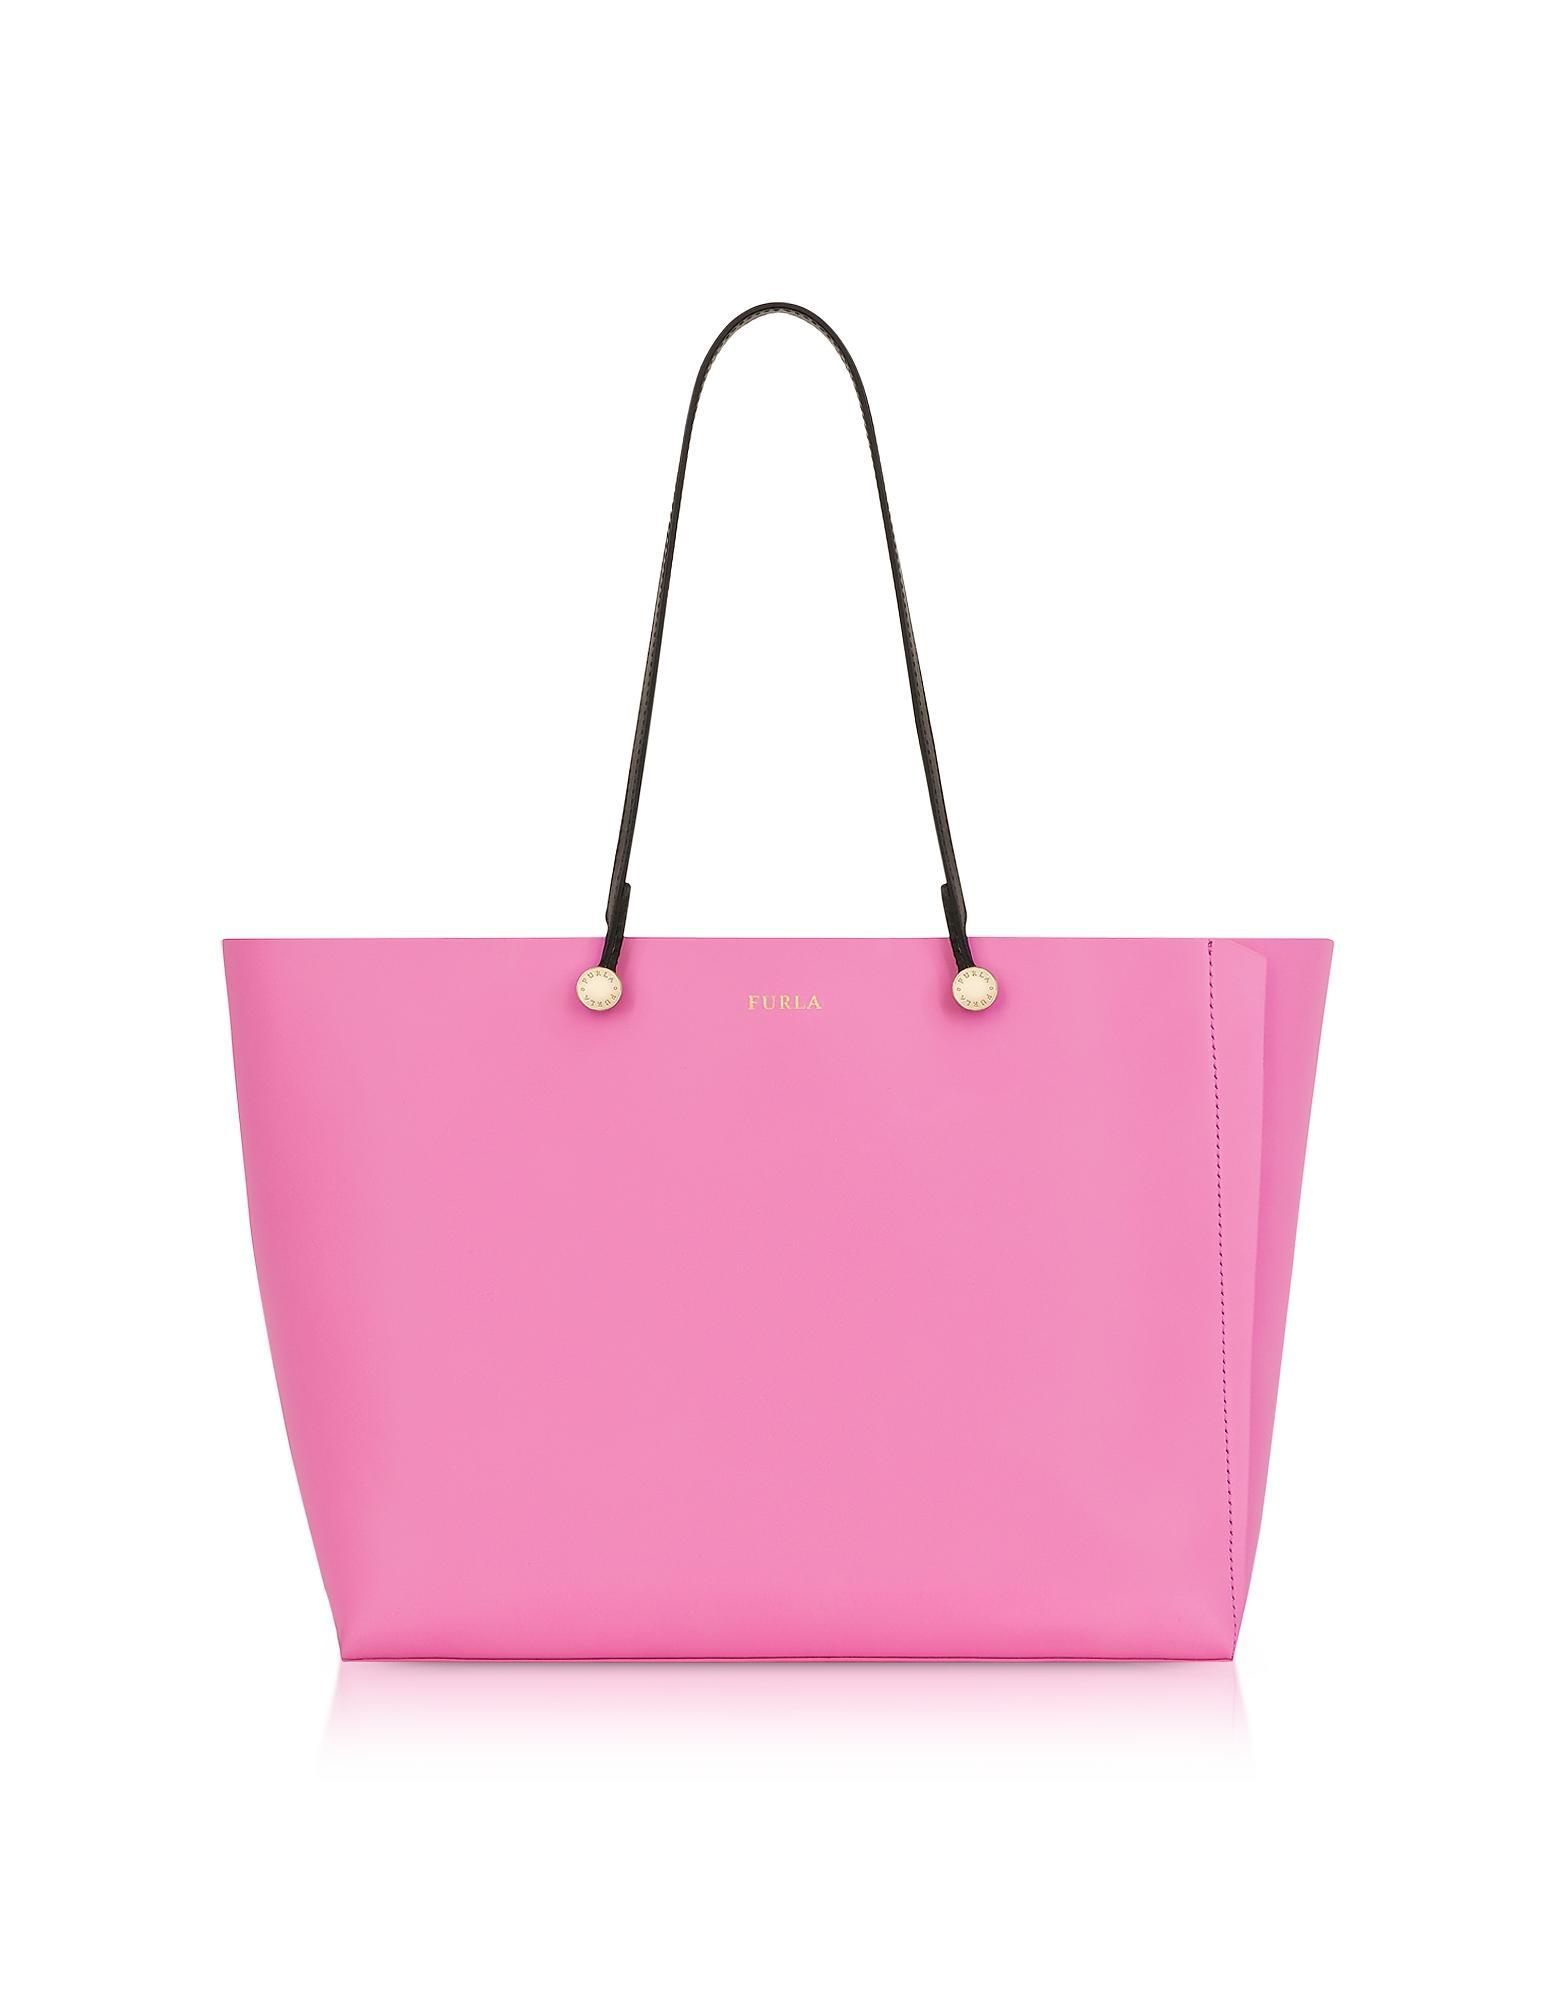 68e4cc05426b11 Furla - Pink Toni Orchidea Floris Printed Leather Eden Medium Tote Bag -  Lyst. View fullscreen